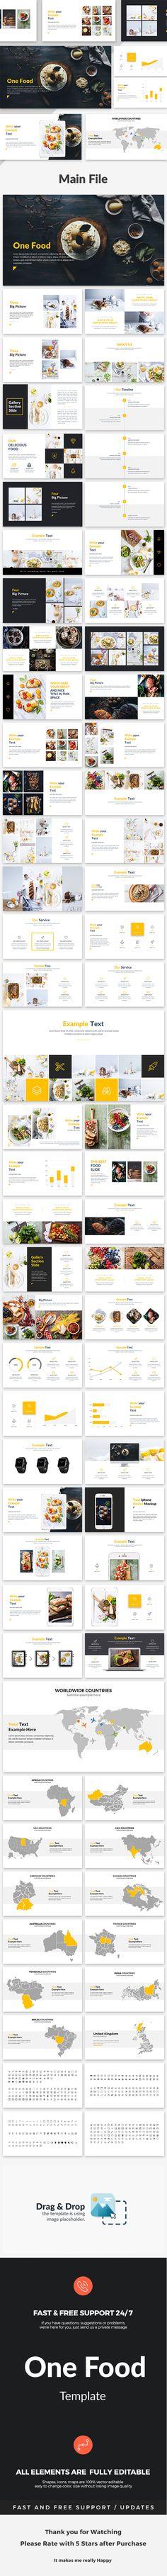 One Food Creative Keynote Template — Keynote KEY #template #powerpoint presentation • Download ➝ https://graphicriver.net/item/one-food-creative-keynote-template/18799287?ref=pxcr